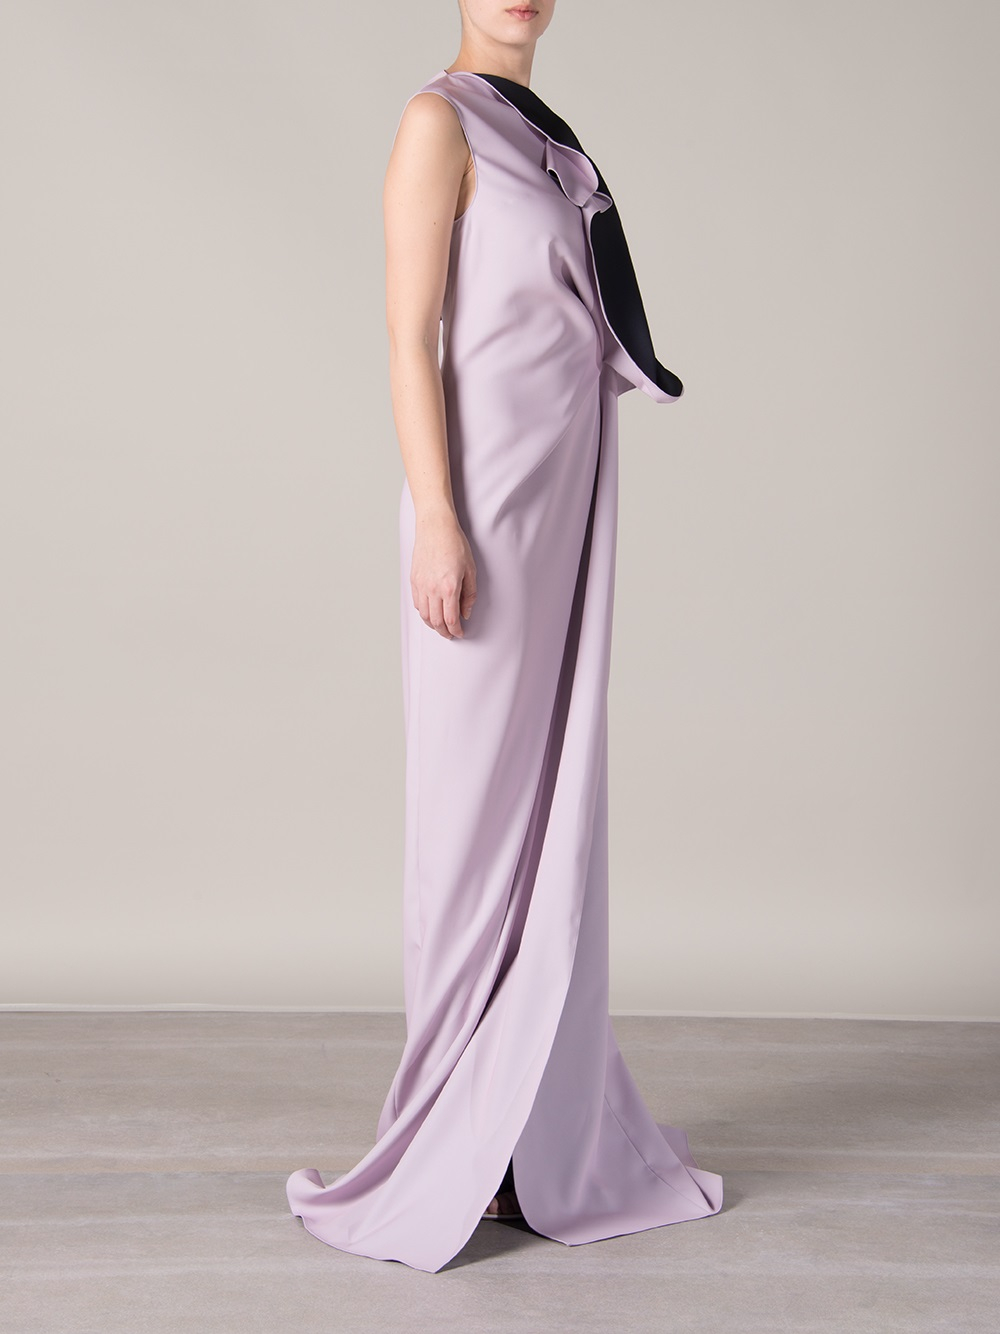 Lyst Maison Rabih Kayrouz Ruffled Evening Dress In Pink